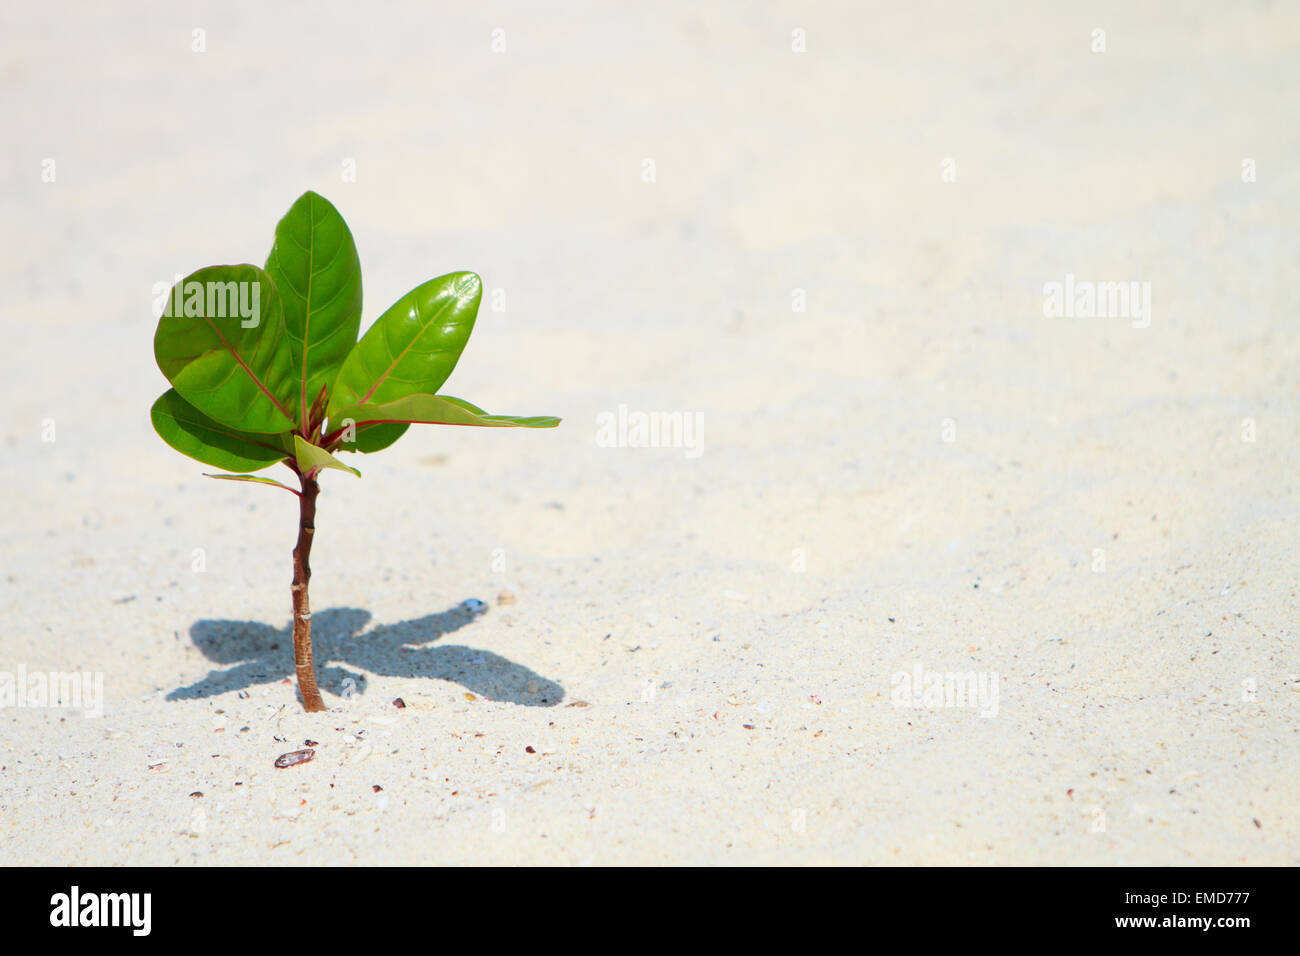 Junge Pflanze wächst am Strand Stockbild